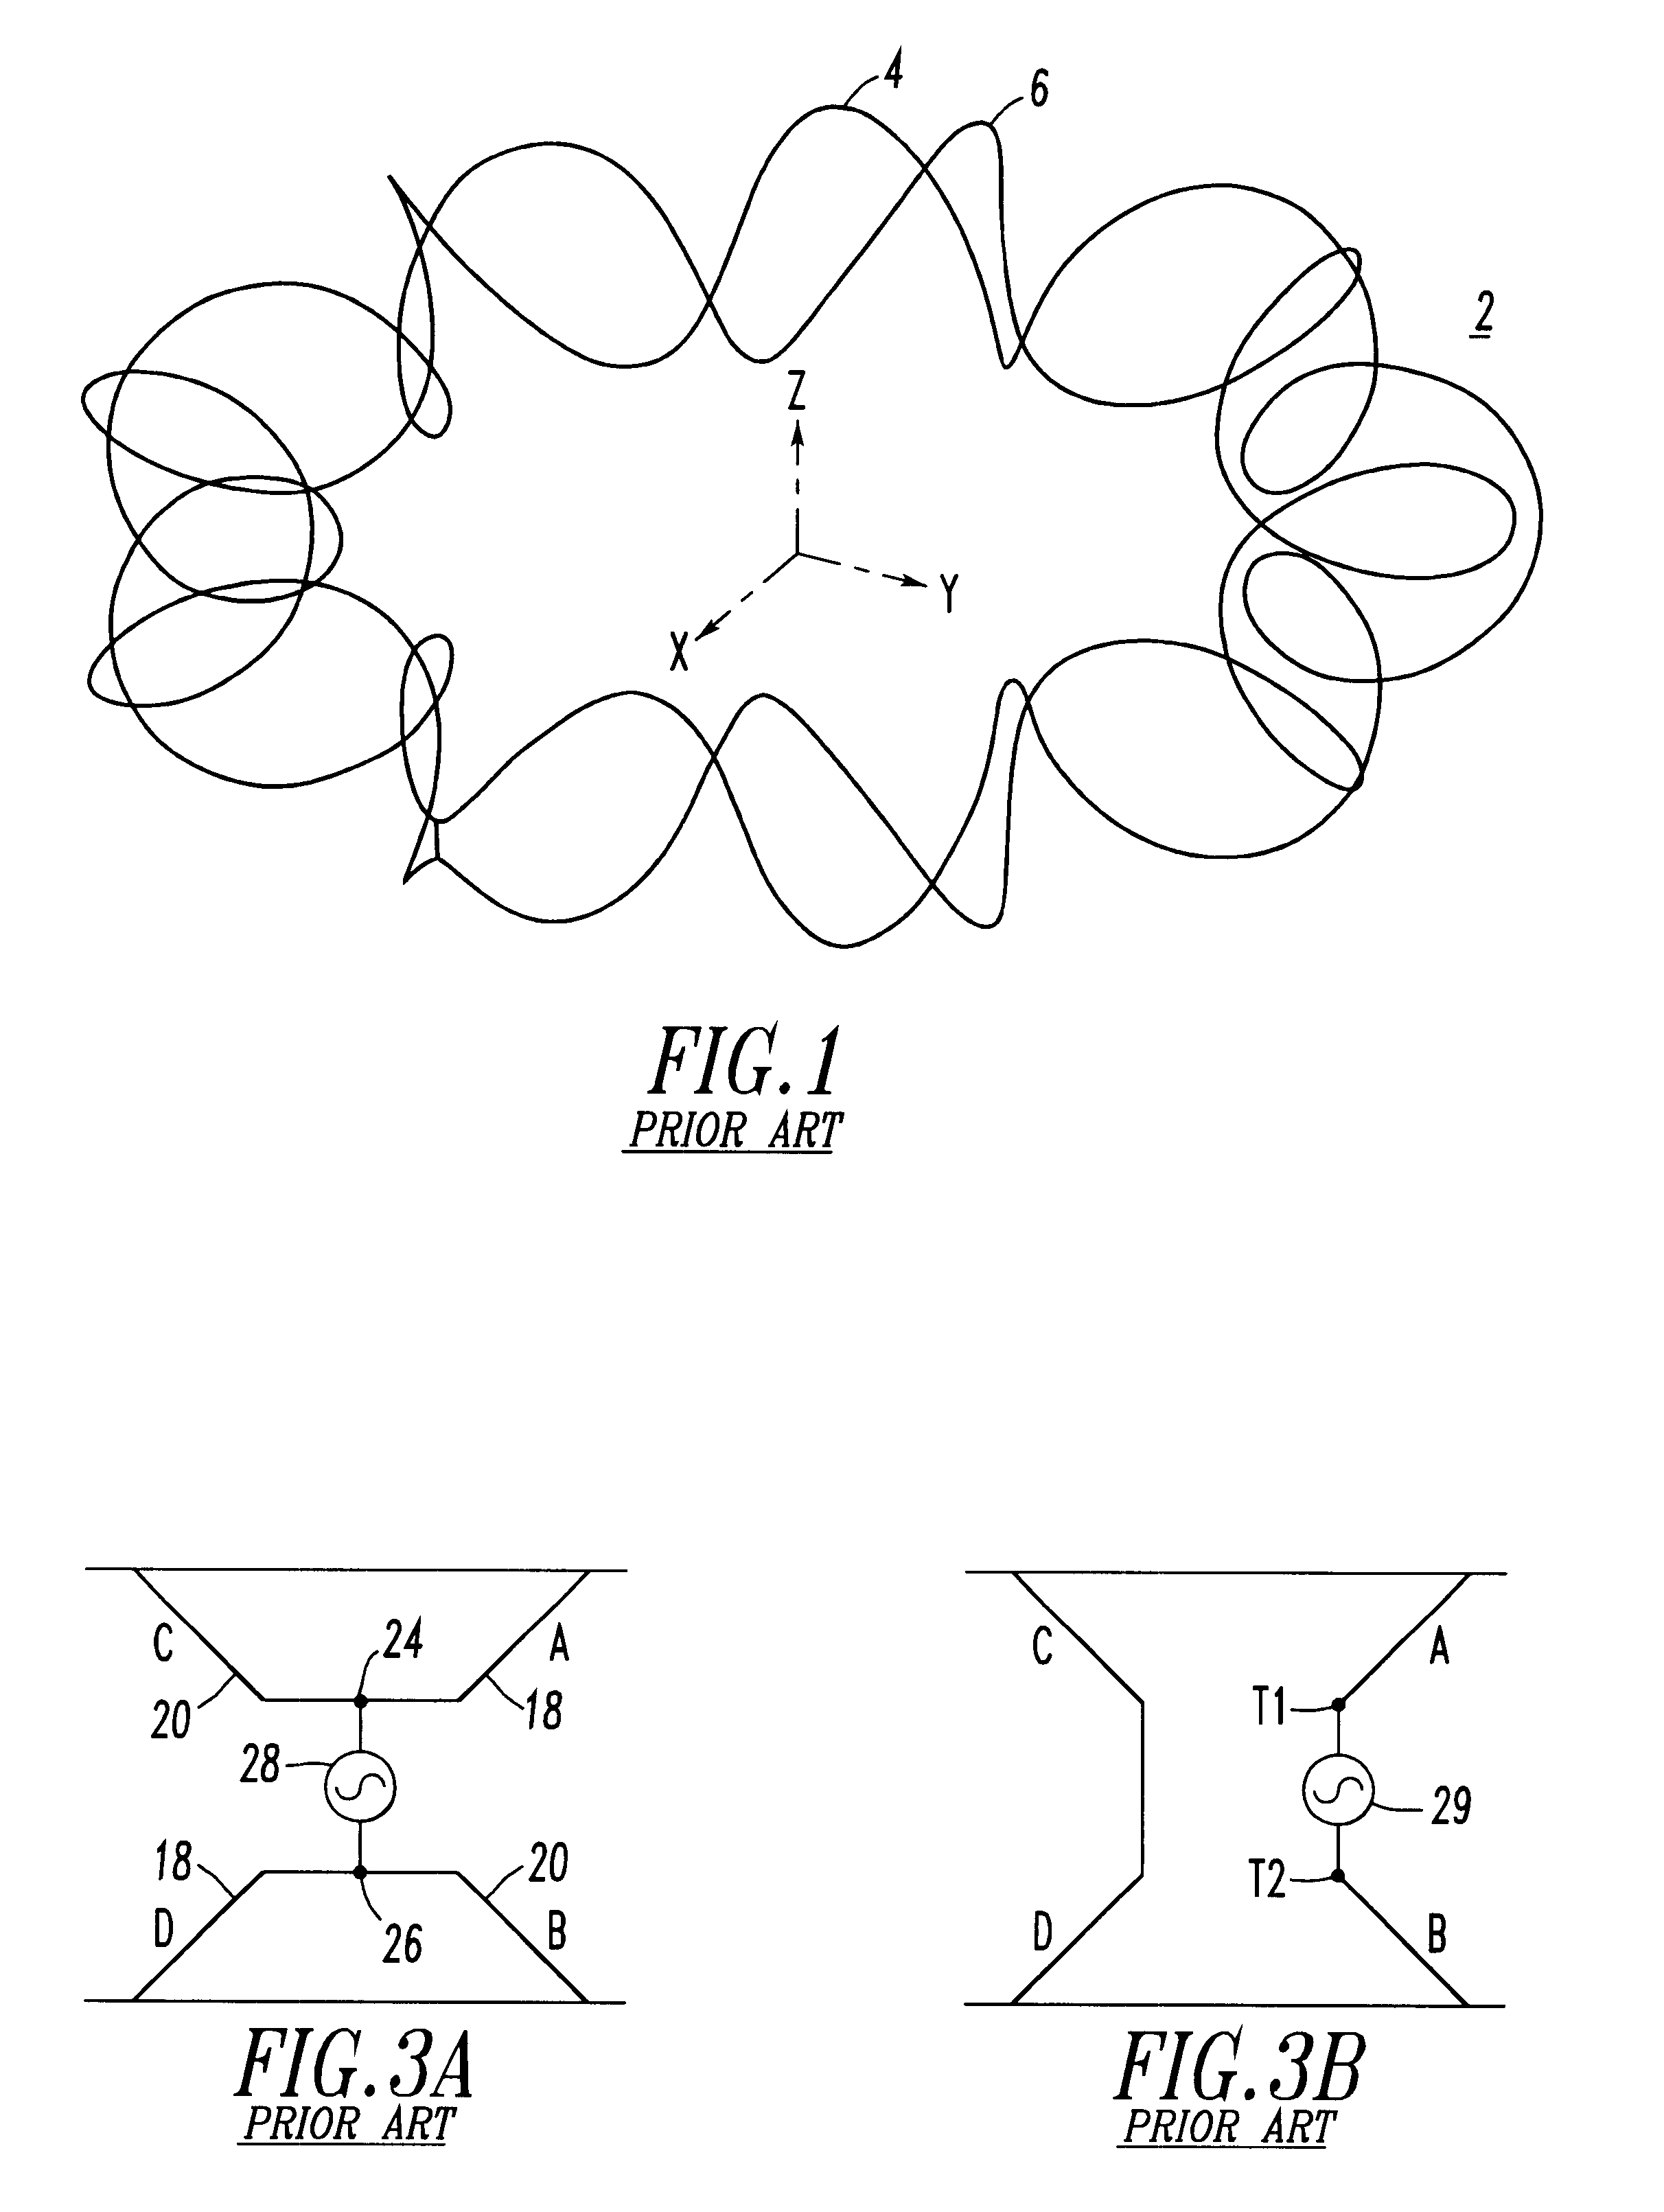 viper remote starter wiring diagram images car alarm wiring diagram on design tech remote starter wiring